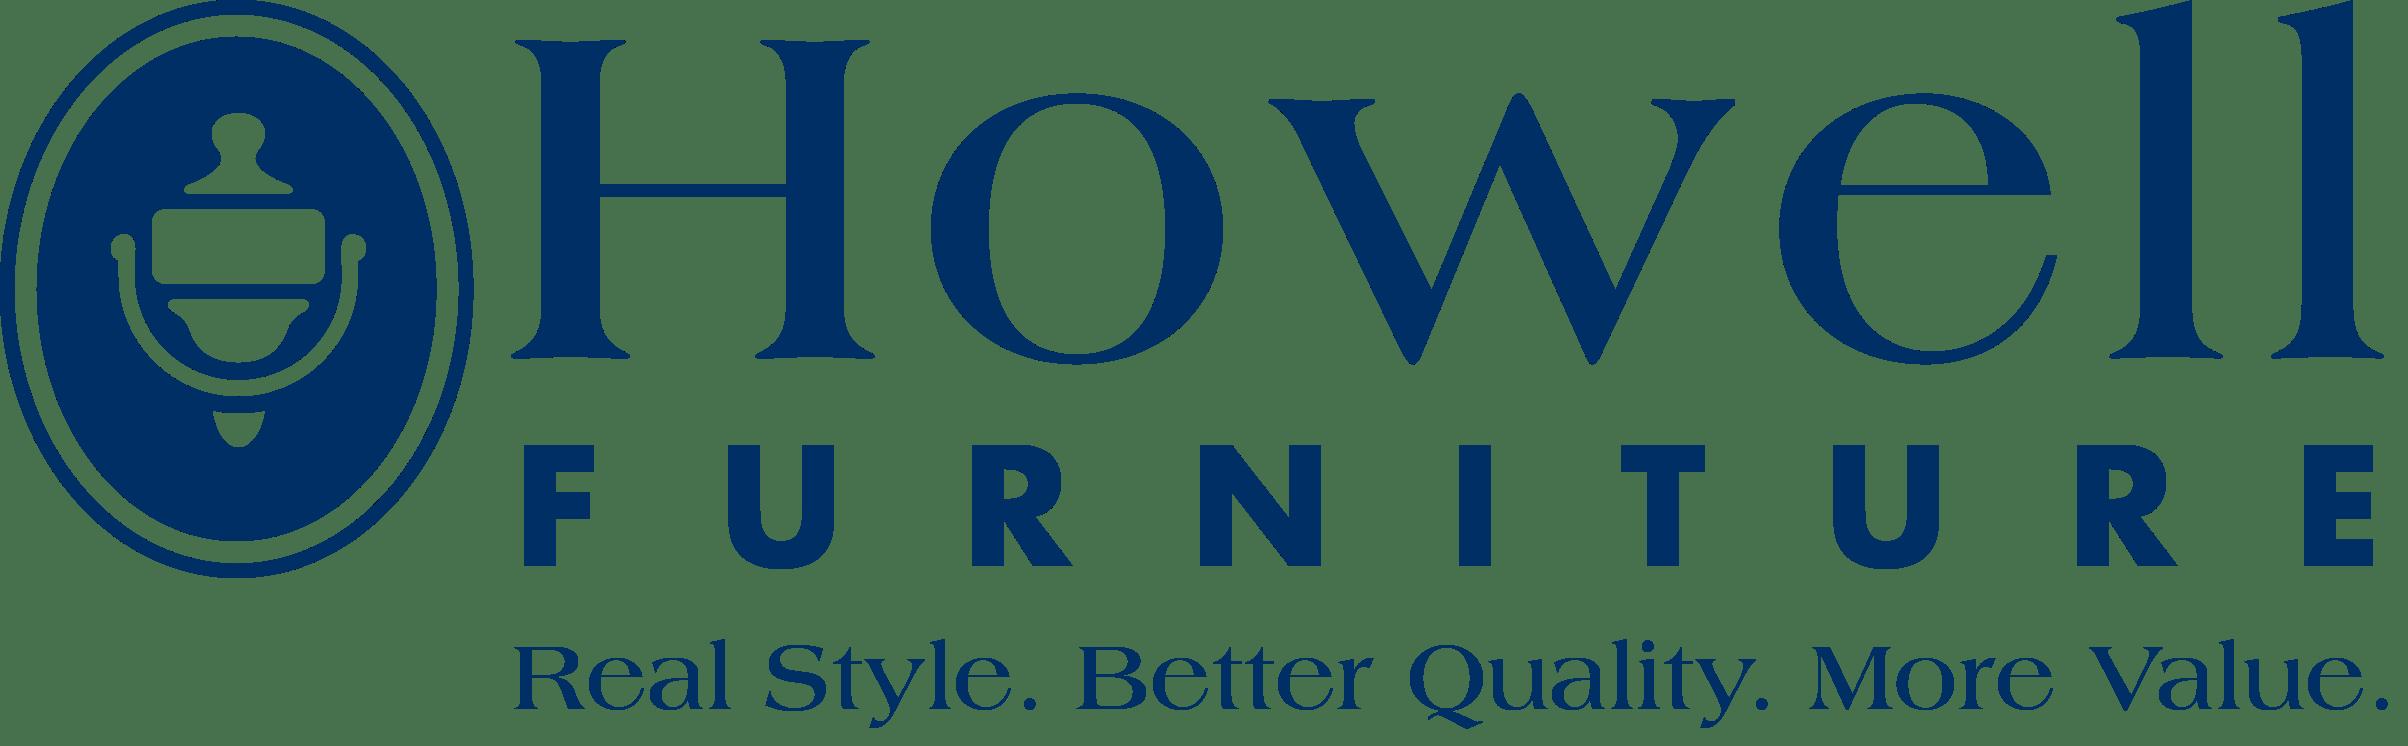 Howell Furniture   Beaumont, Port Arthur, Nederland, Texas, Lake Charles,  Louisiana Furniture Store